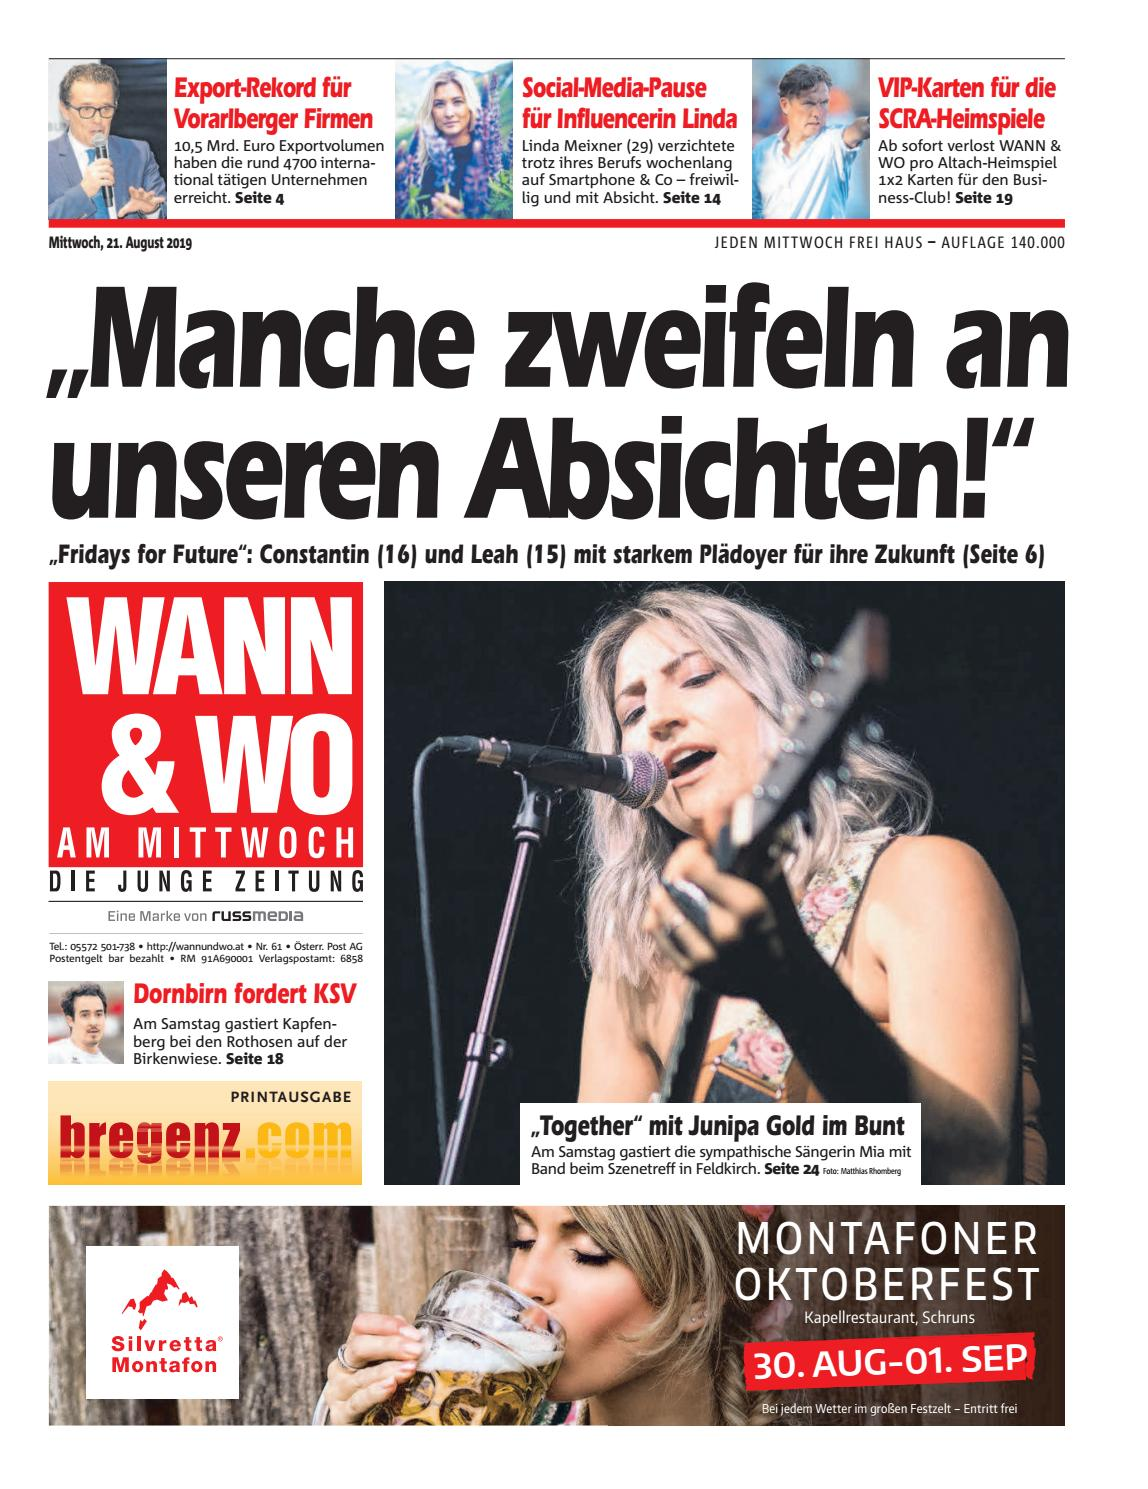 Vorarlberg frau aus sucht mann - Mhldorf bei feldbach frauen